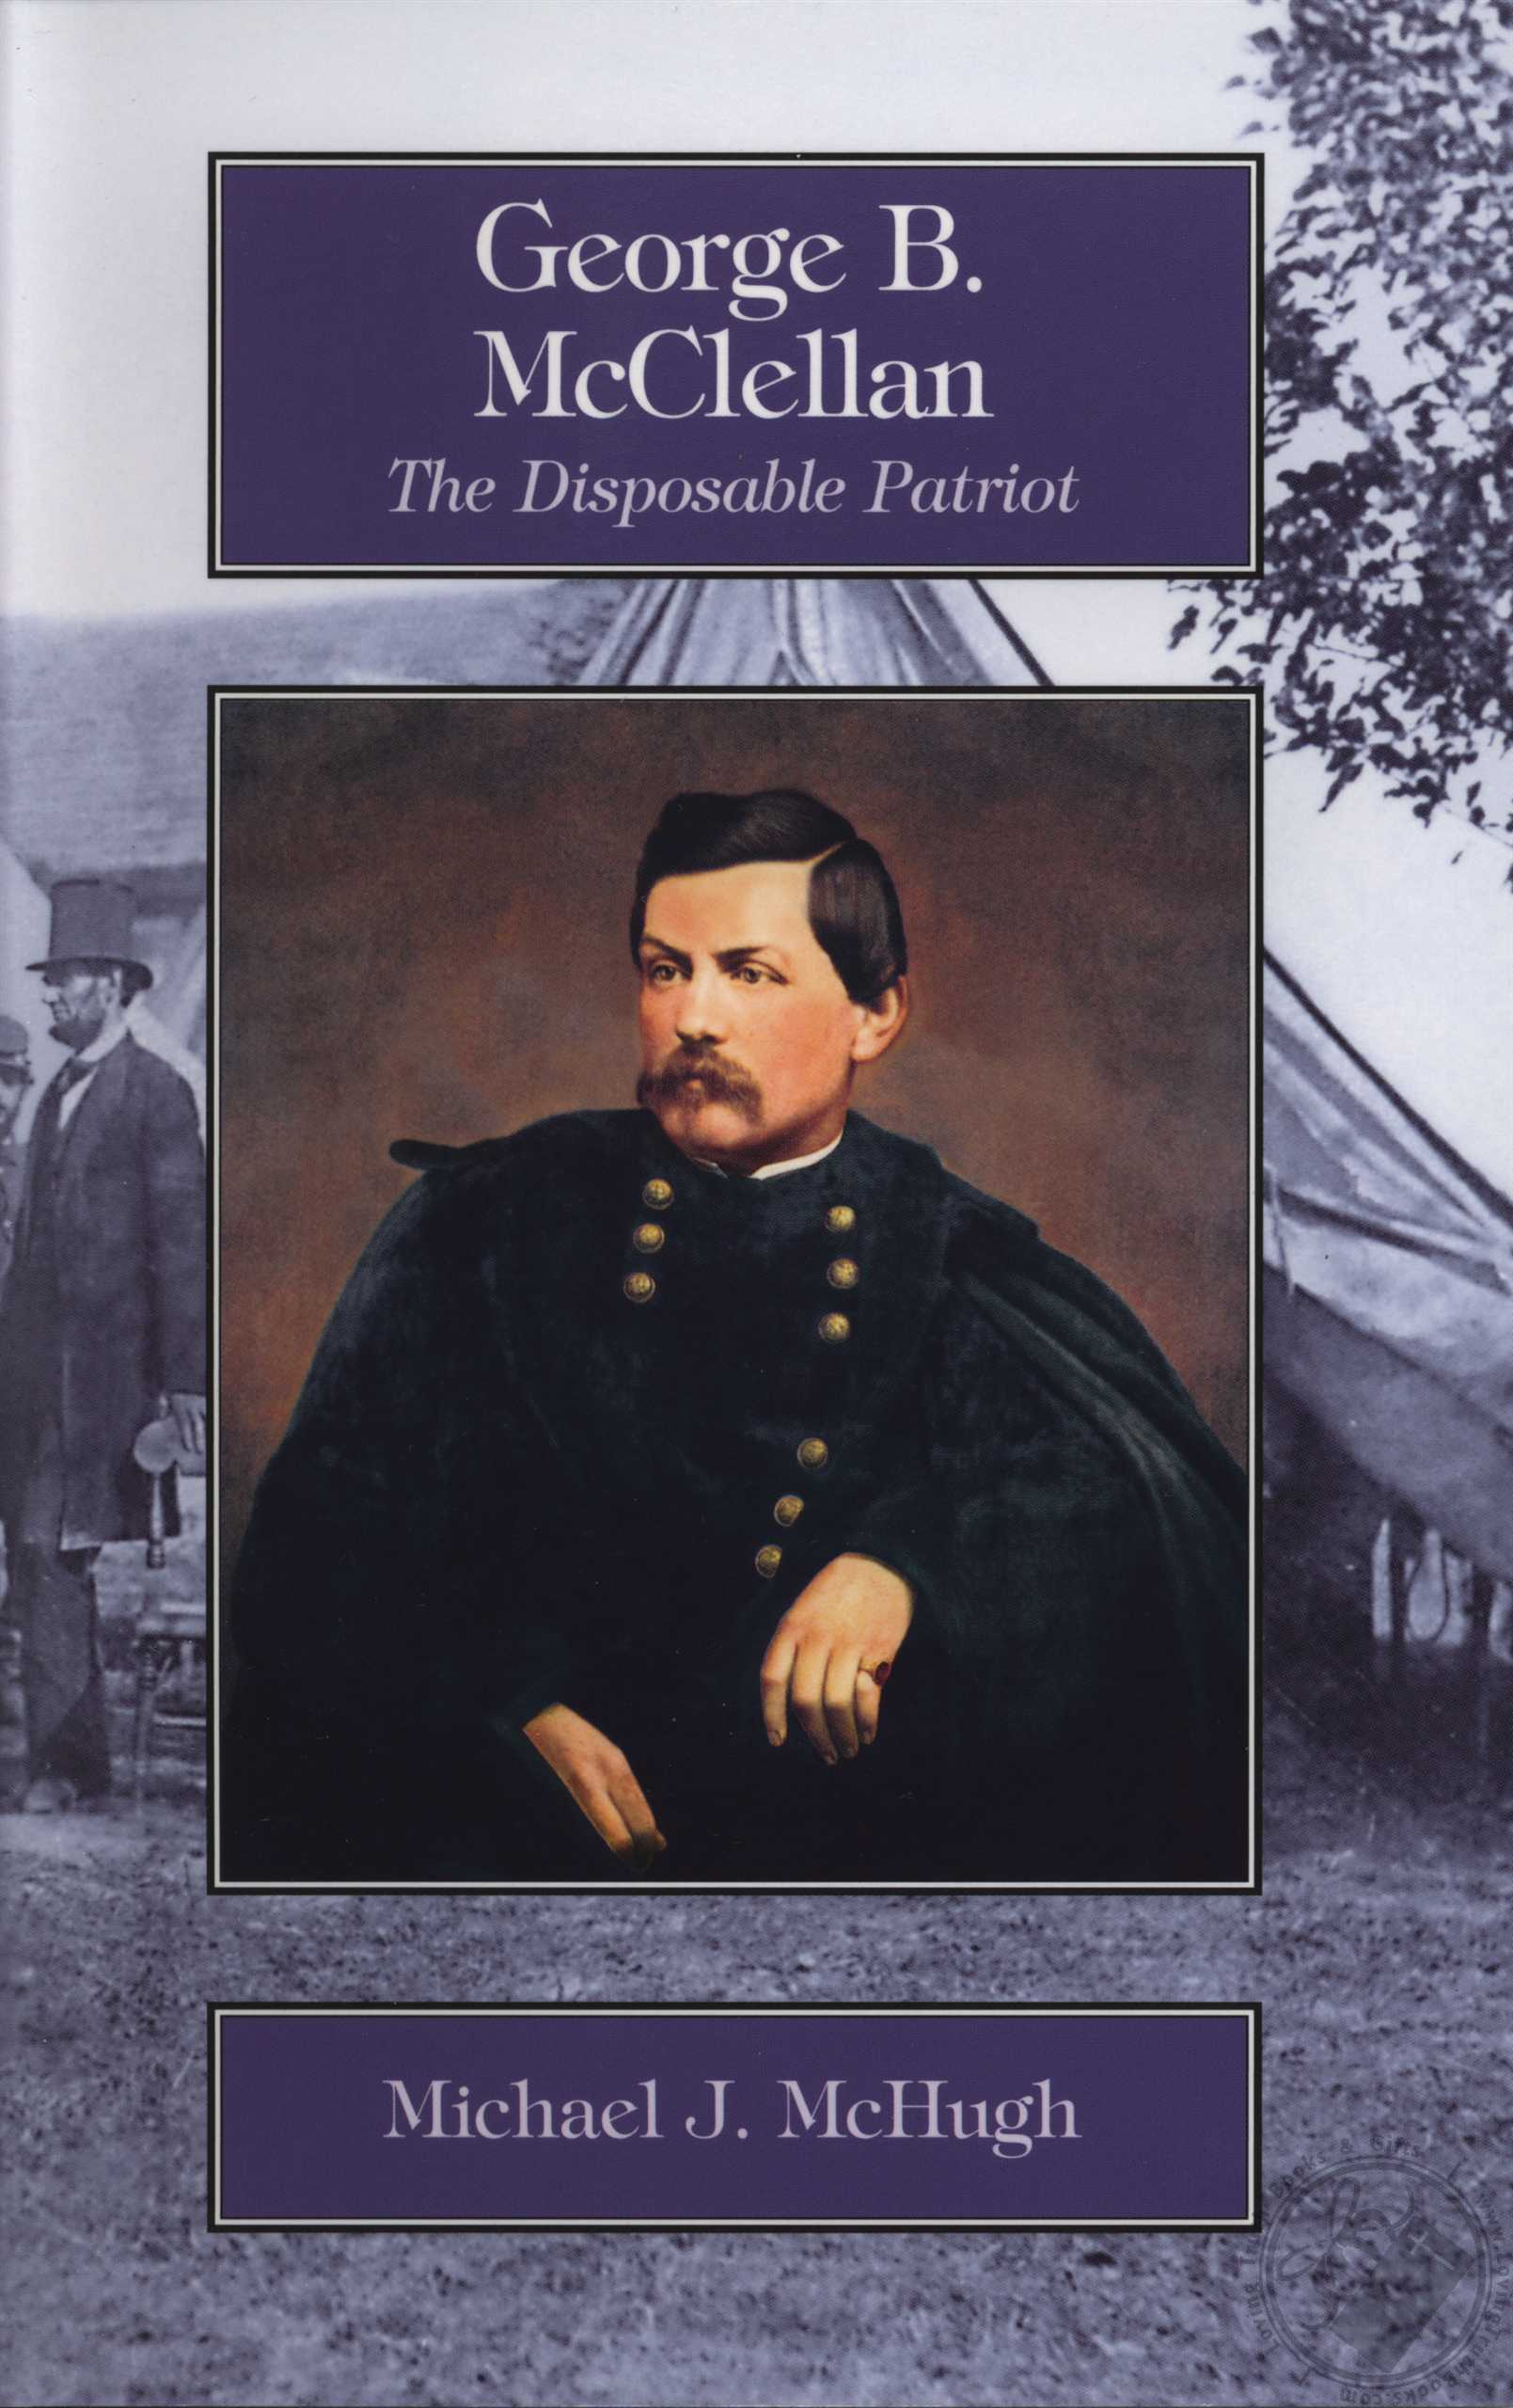 An analysis of george b mcclellan the disposable patriot a biography by michael j mchugh